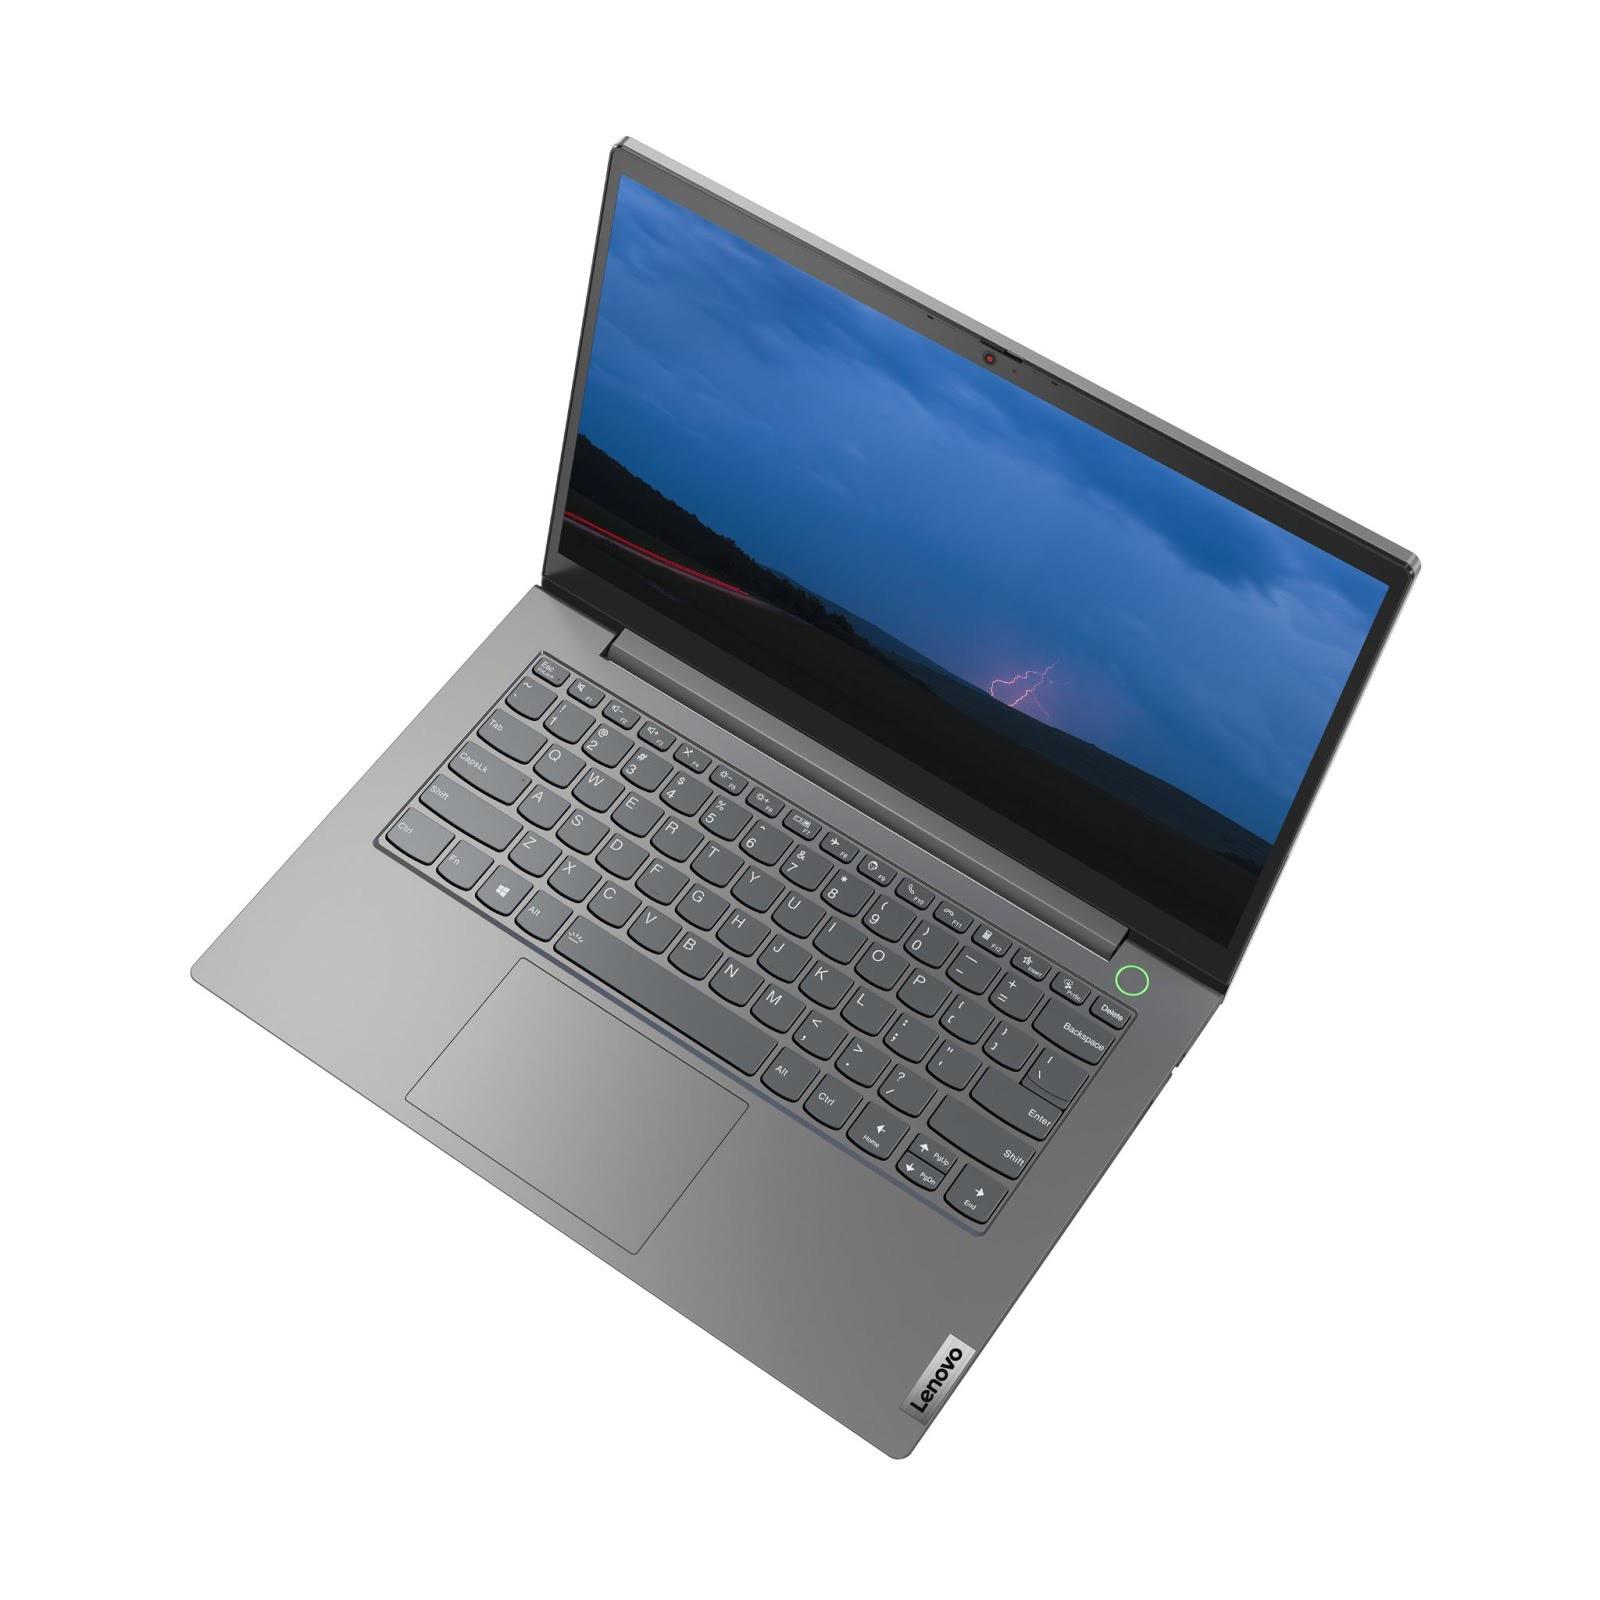 Фото 3. Ноутбук Lenovo ThinkBook 14 Gen 2 ARE Mineral Grey (20VF0039RU)